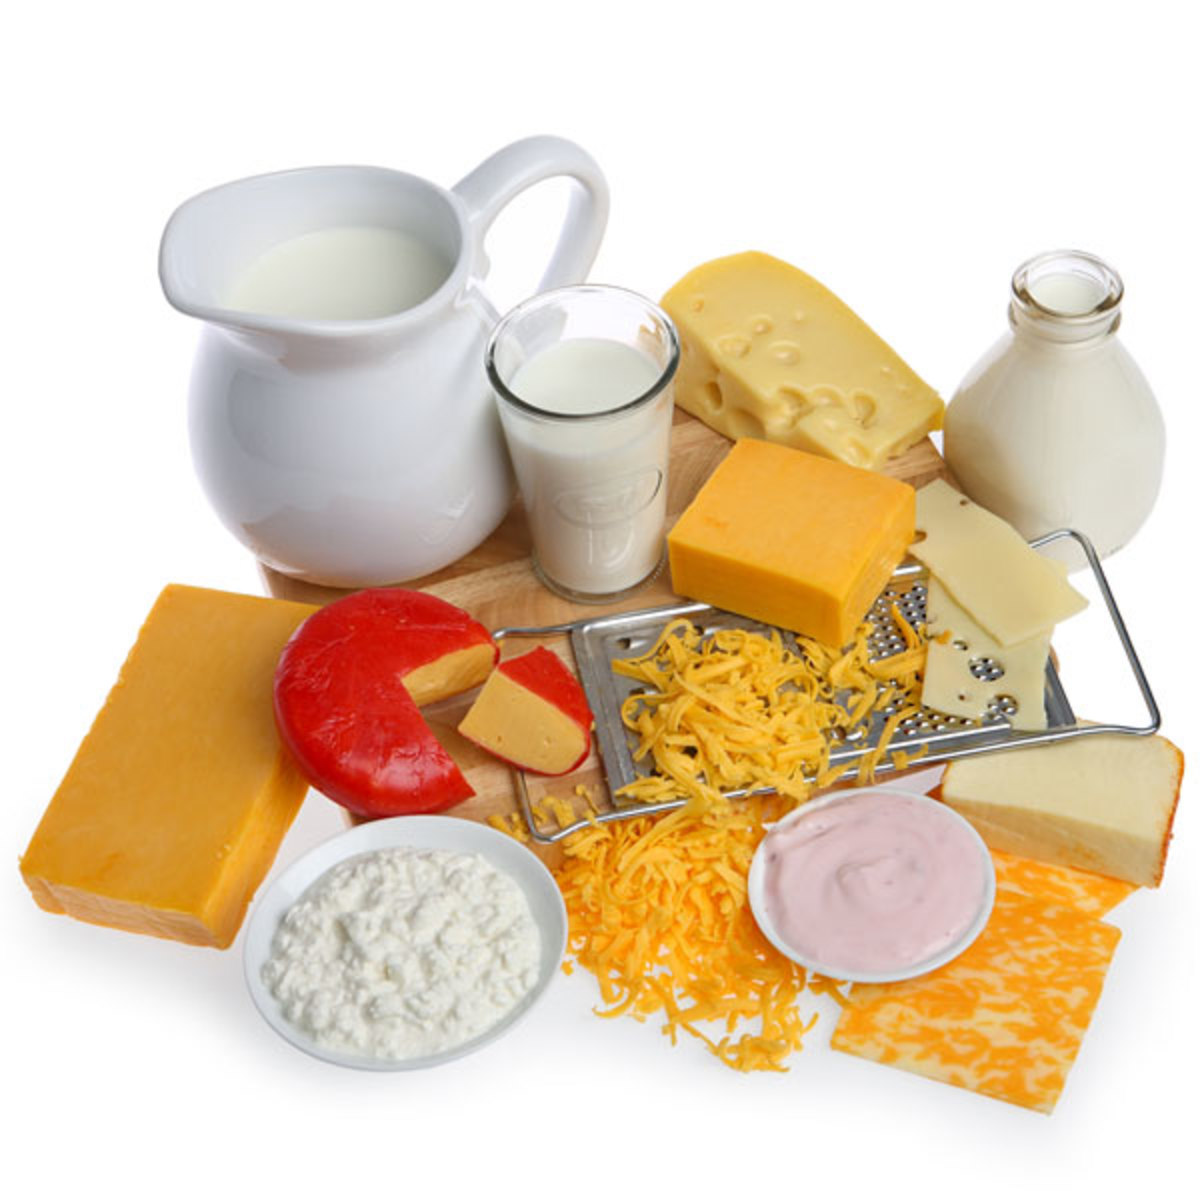 danger-zone-for-food-poisoning-bacteria